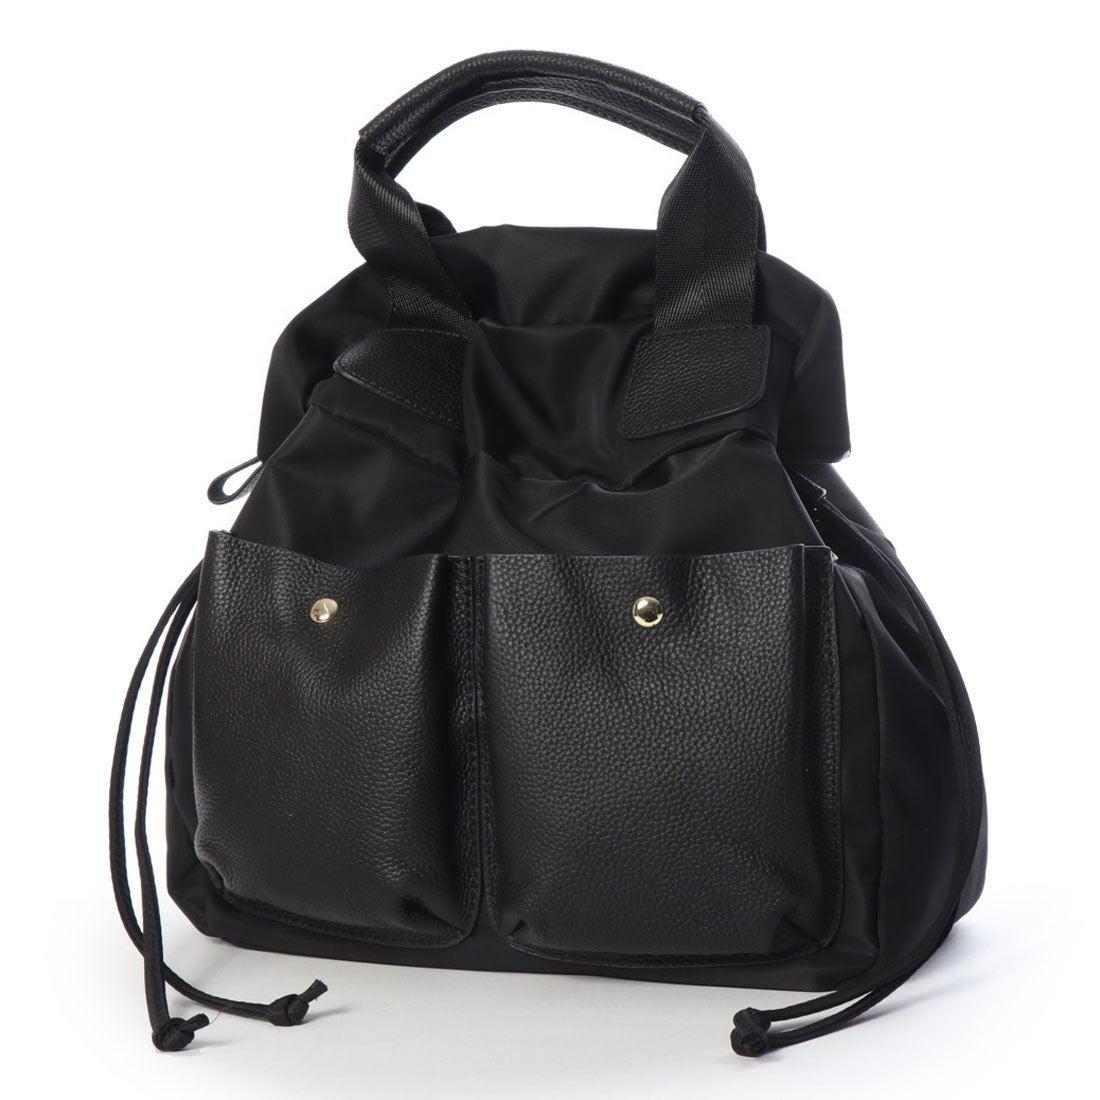 625a45aab30d ヴィータフェリーチェ VitaFelice 本革×ナイロン3wayリュック (ブラック) -靴&ファッション通販 ロコンド〜自宅で試着、気軽に返品